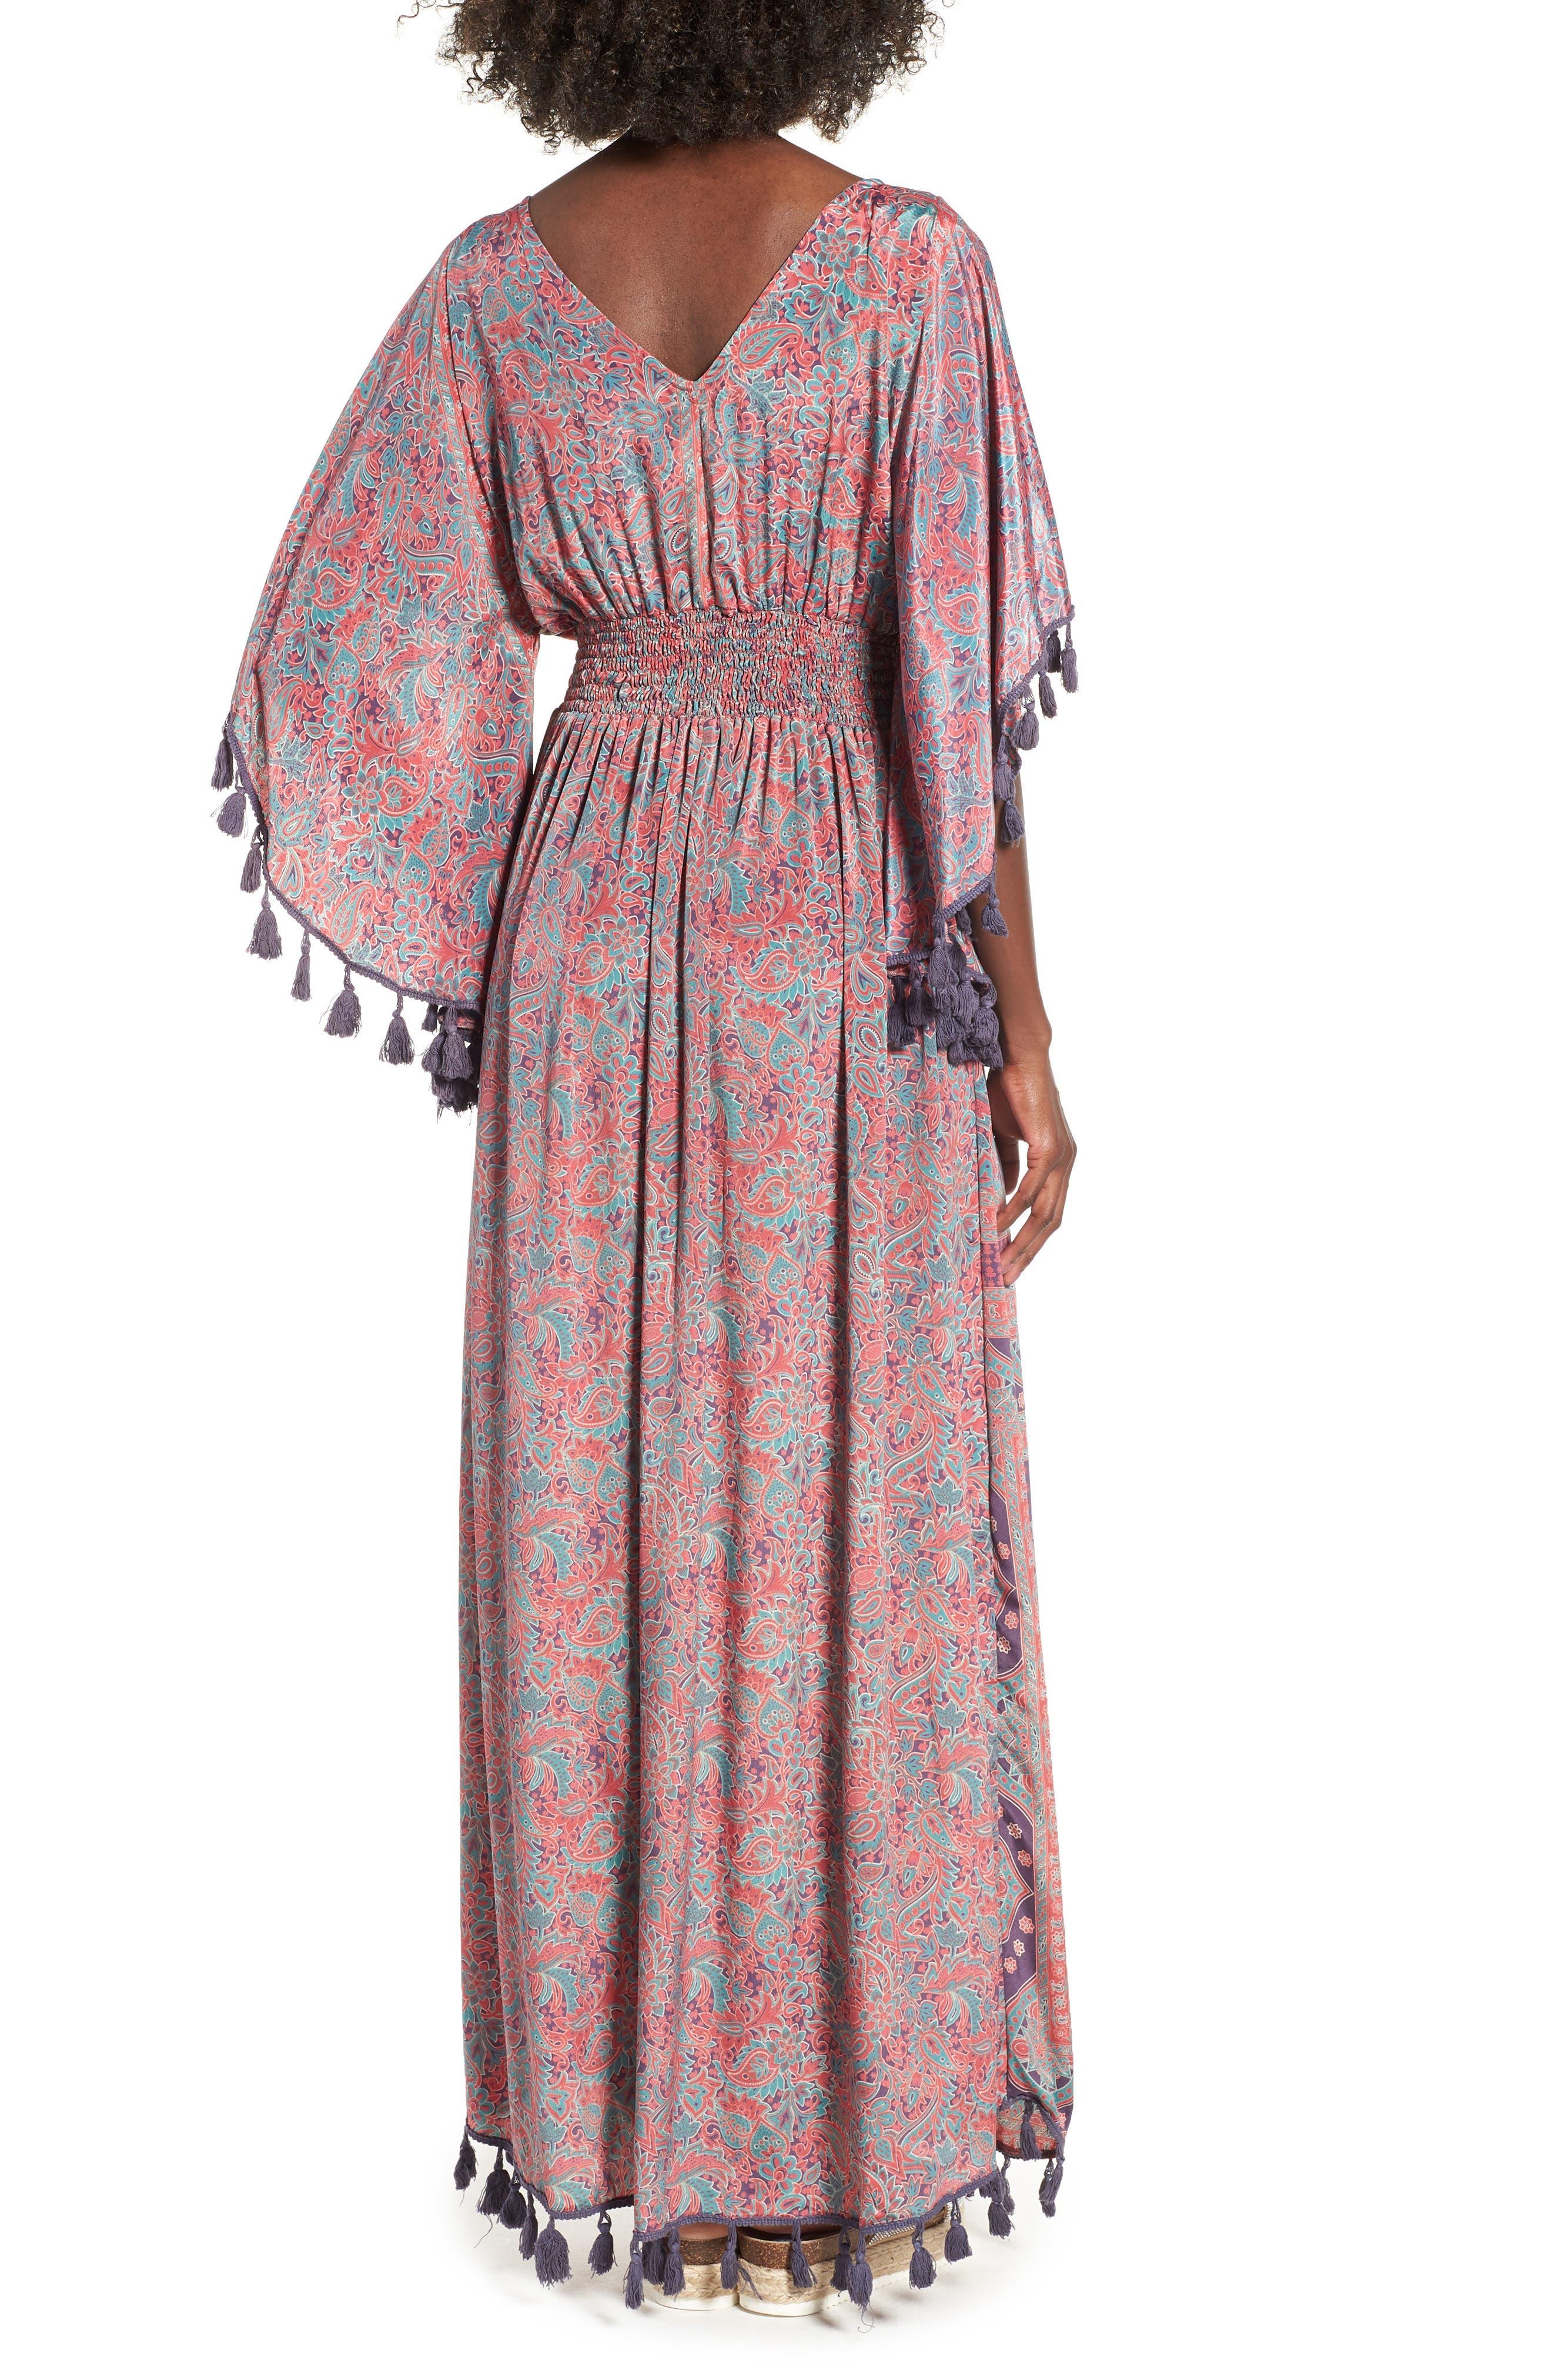 Electric Love Maxi Dress,                             Alternate thumbnail 2, color,                             MULTI